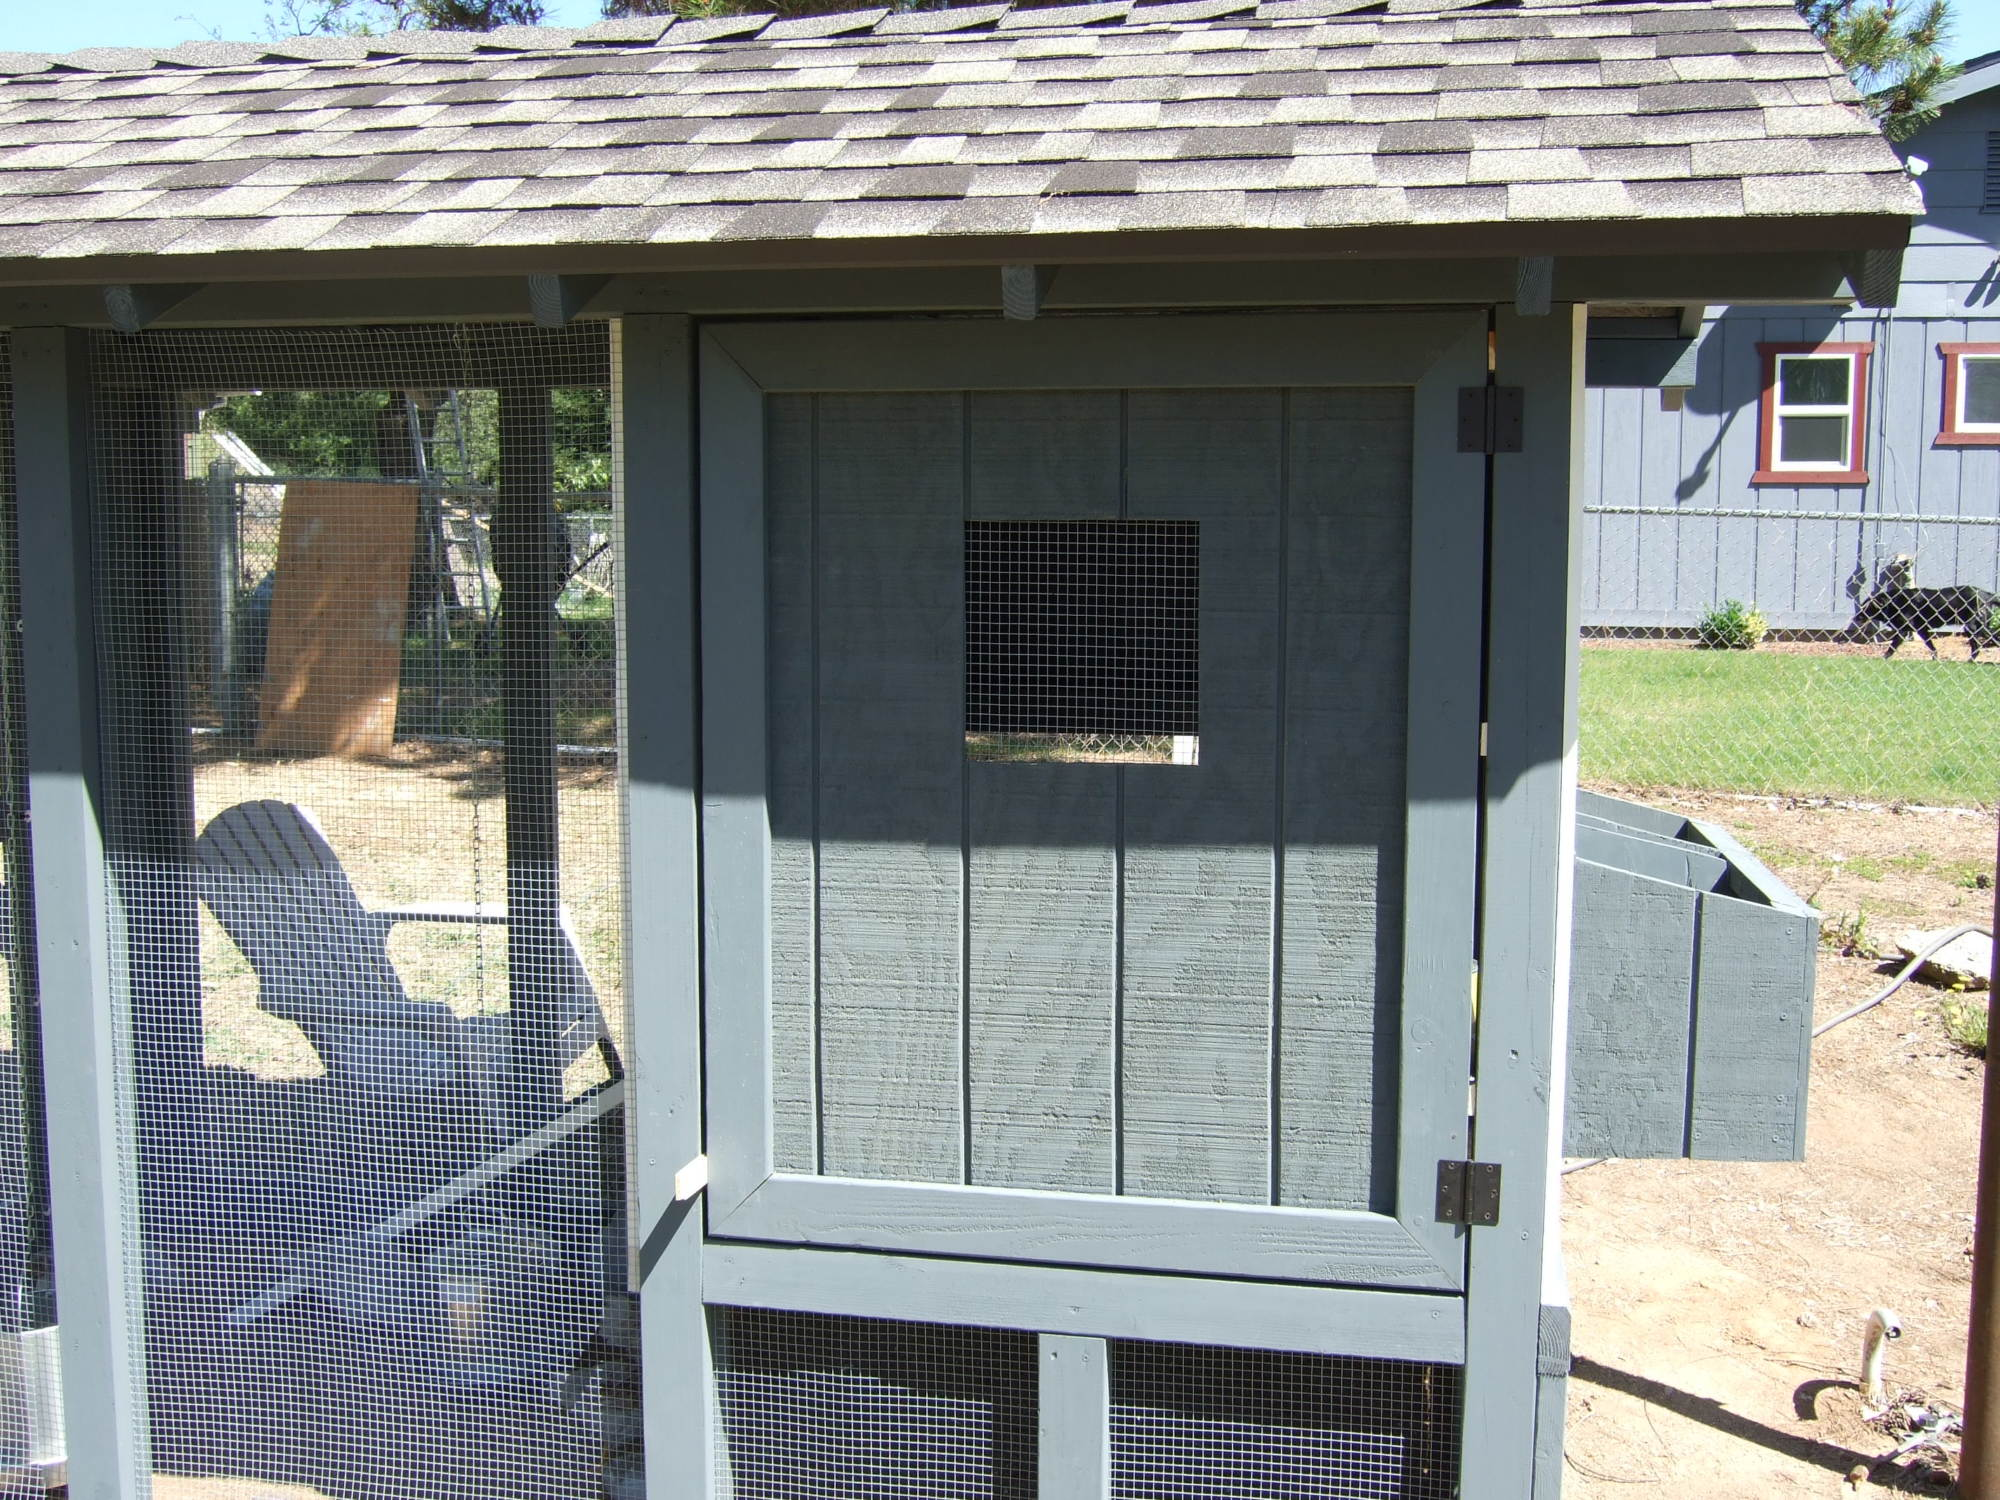 Chicken Coop 04-21-2012 002.JPG